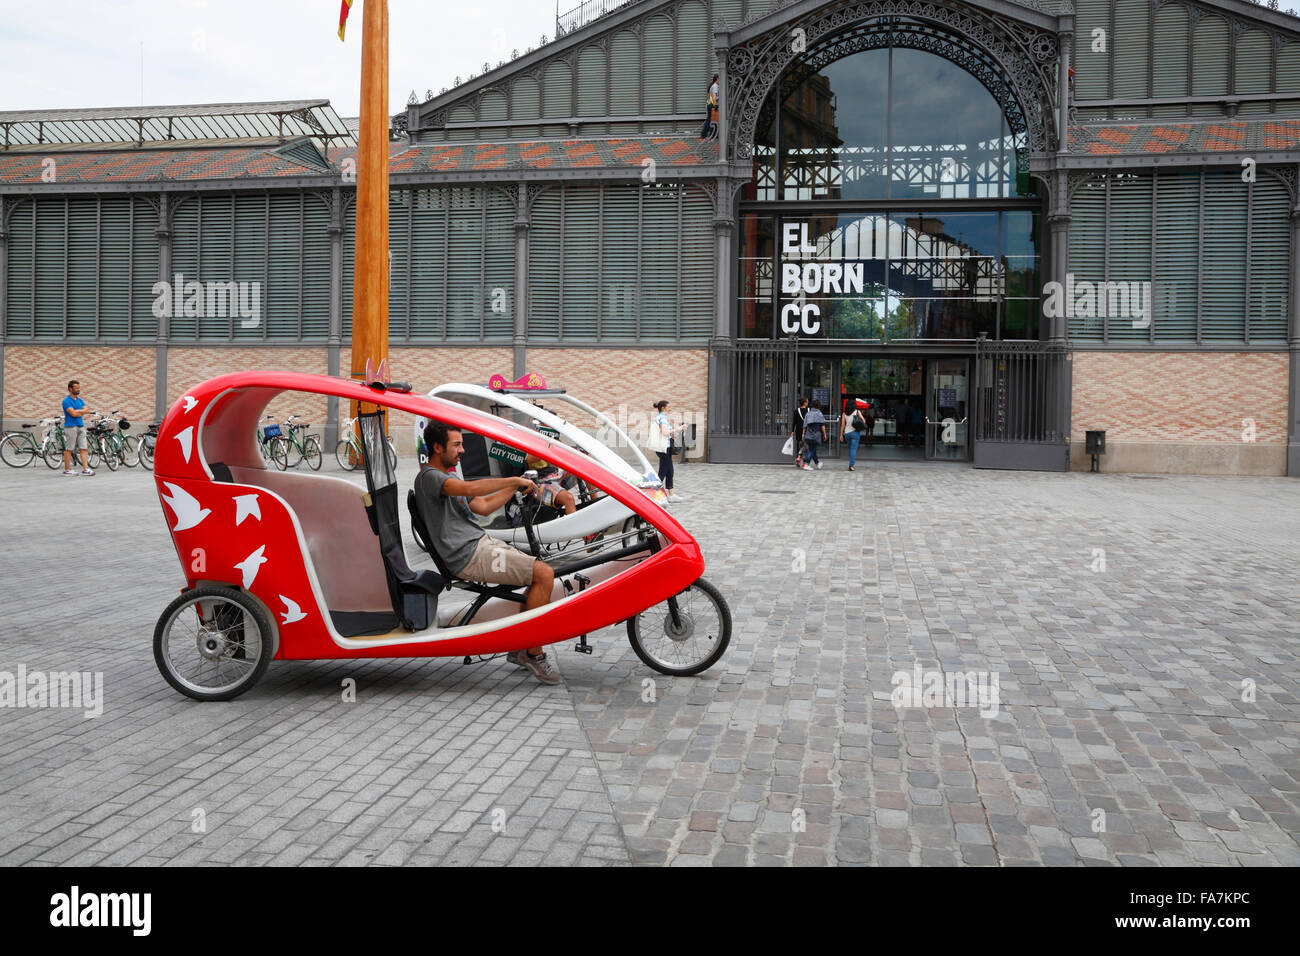 El Born, Rickshaw in front of the old market hall El Born, now Cultural Centre (CC), Barcelona, Spain, Europe - Stock Image